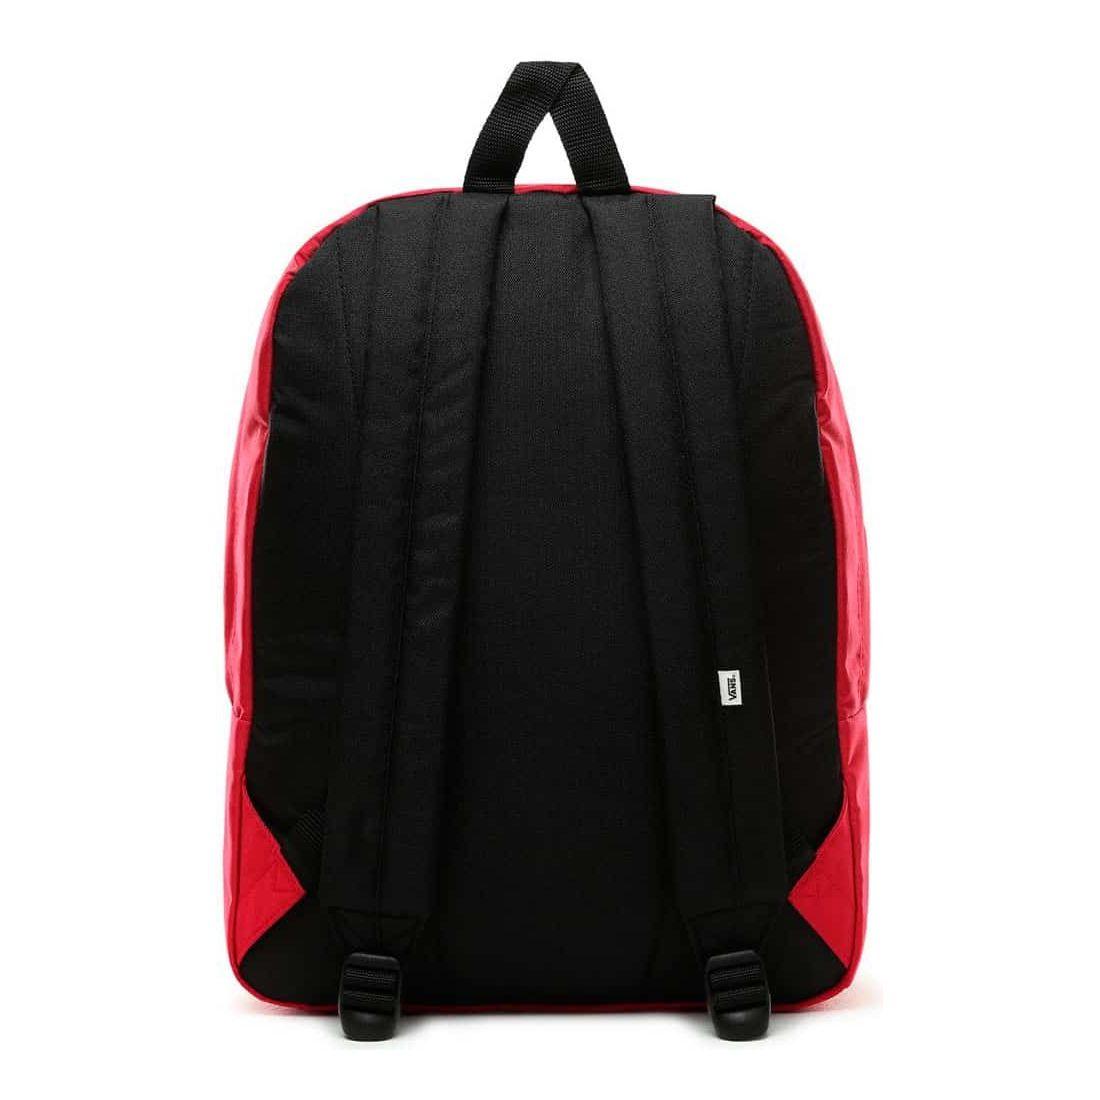 Vans Realm Cherry Vans Backpacks - Bags Running Color: red